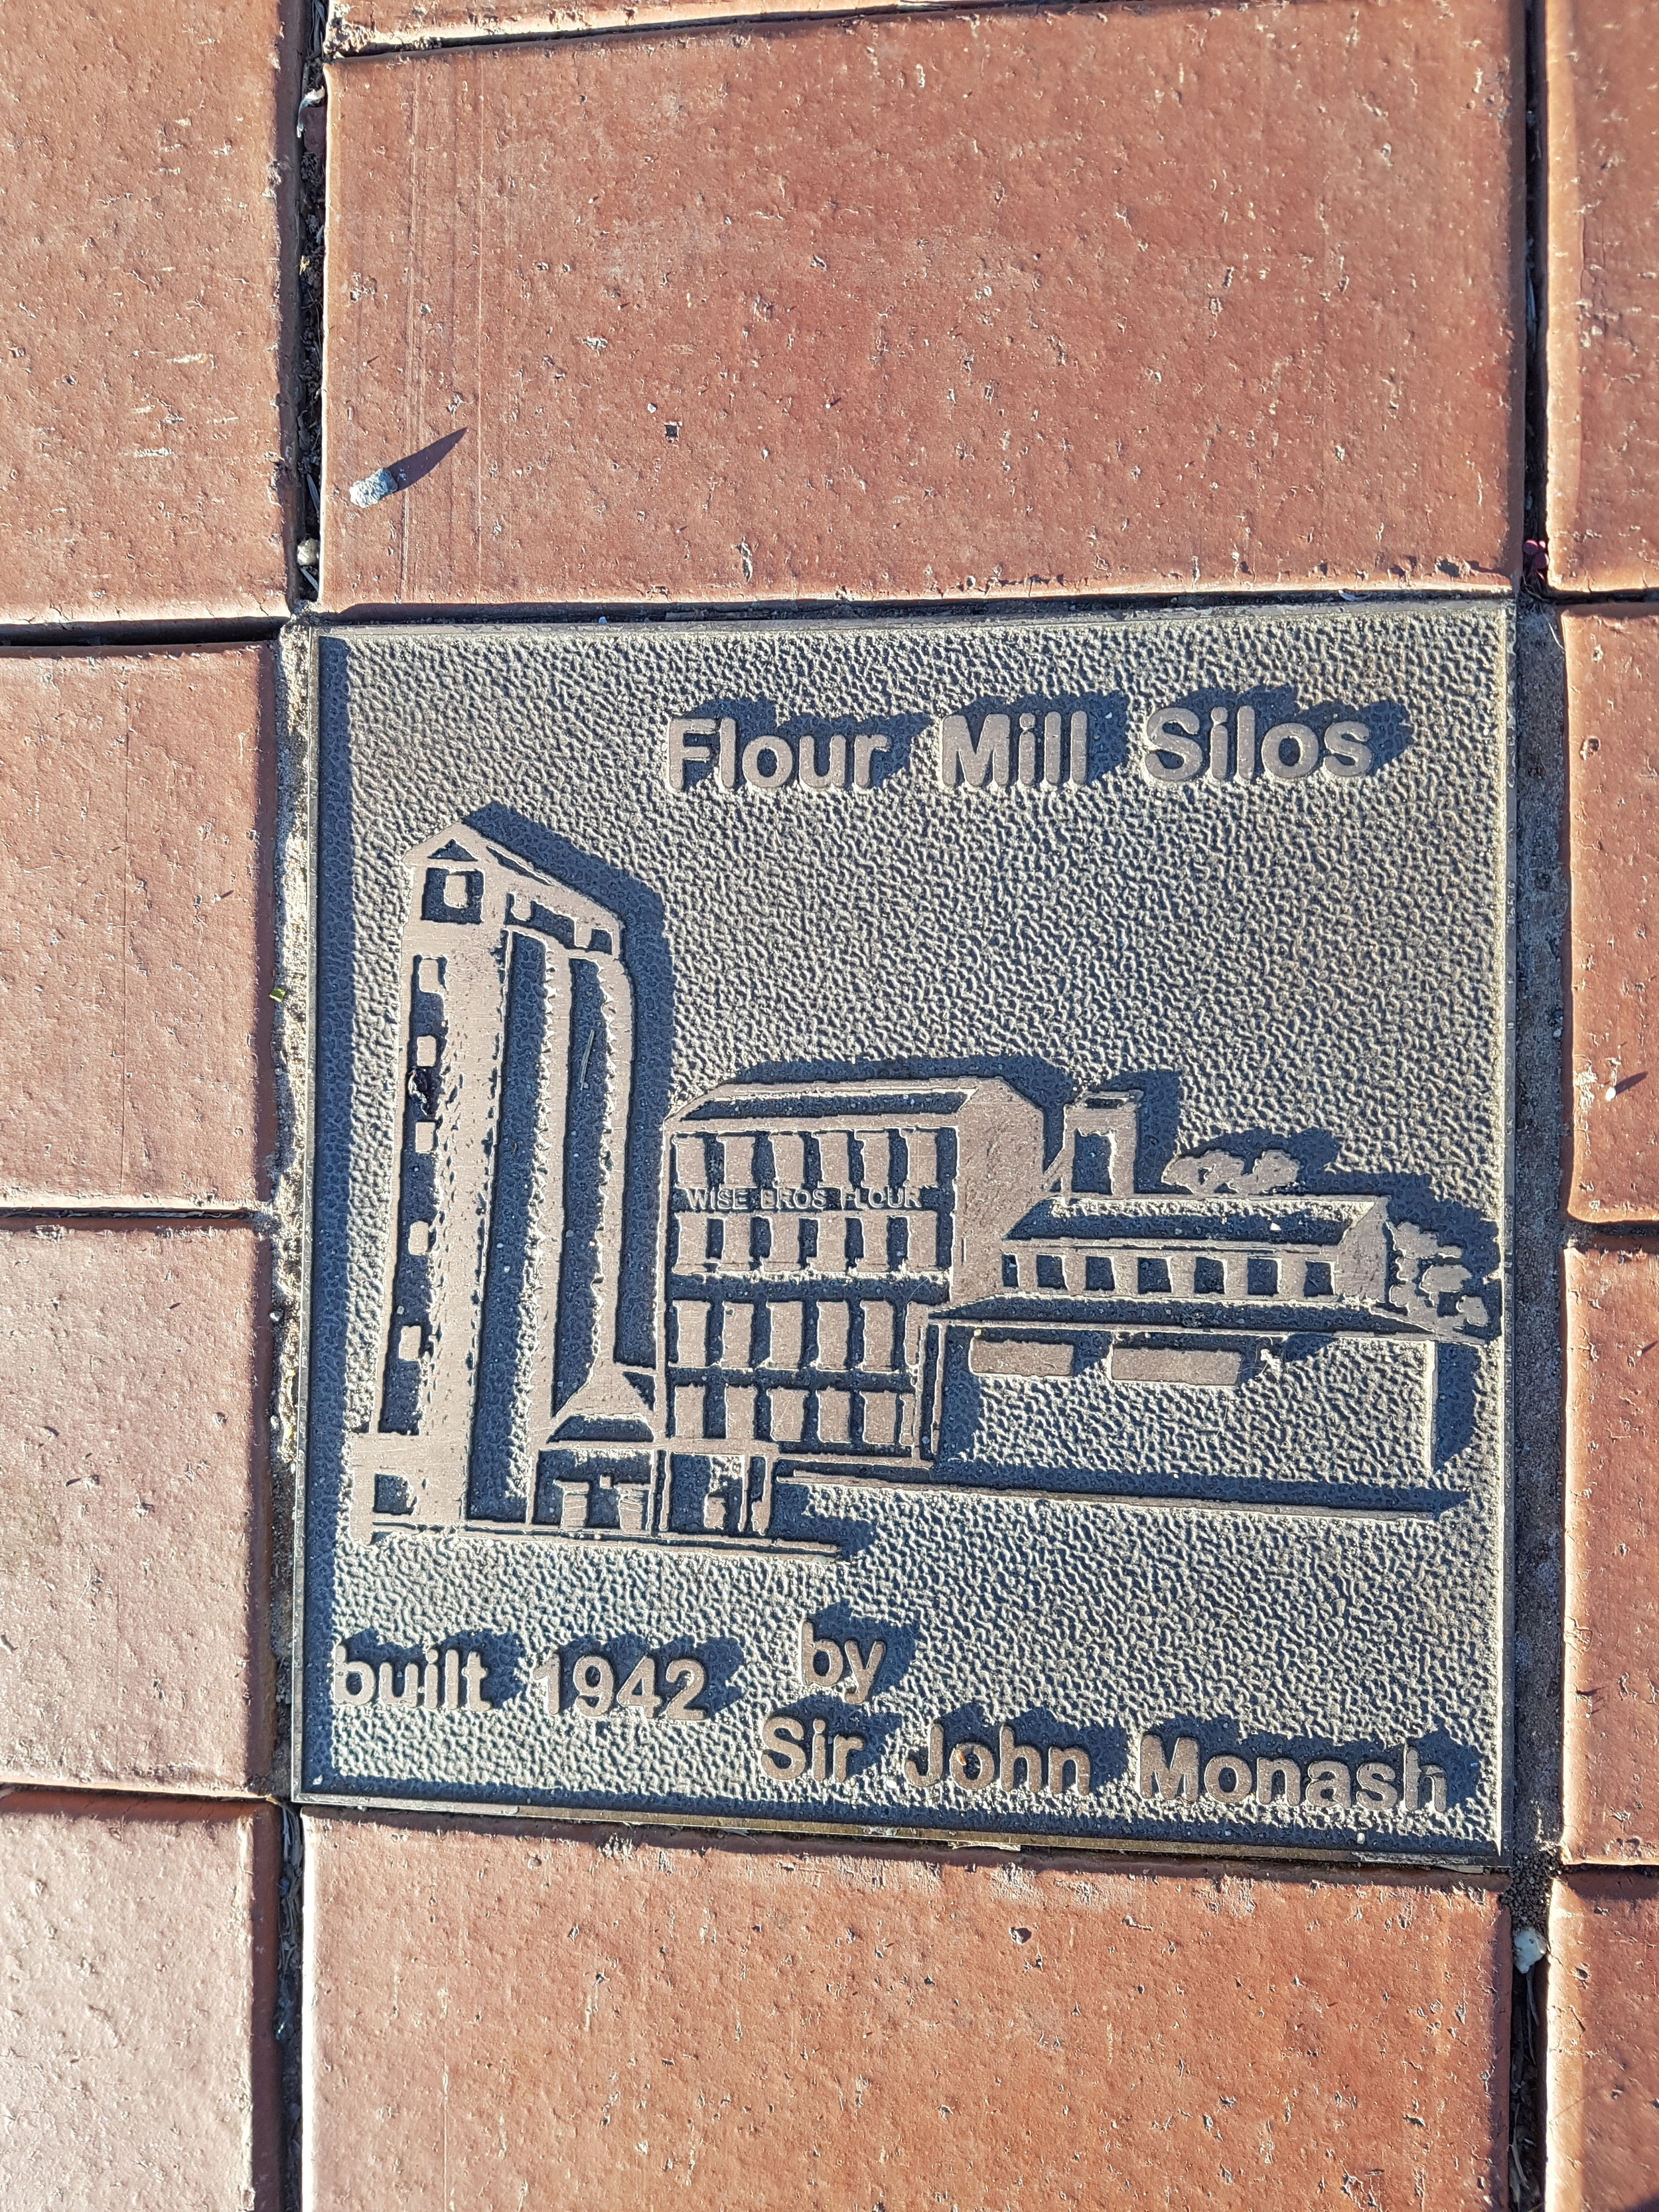 Surely 1912 unless engineering Sir John Monash resurrected@